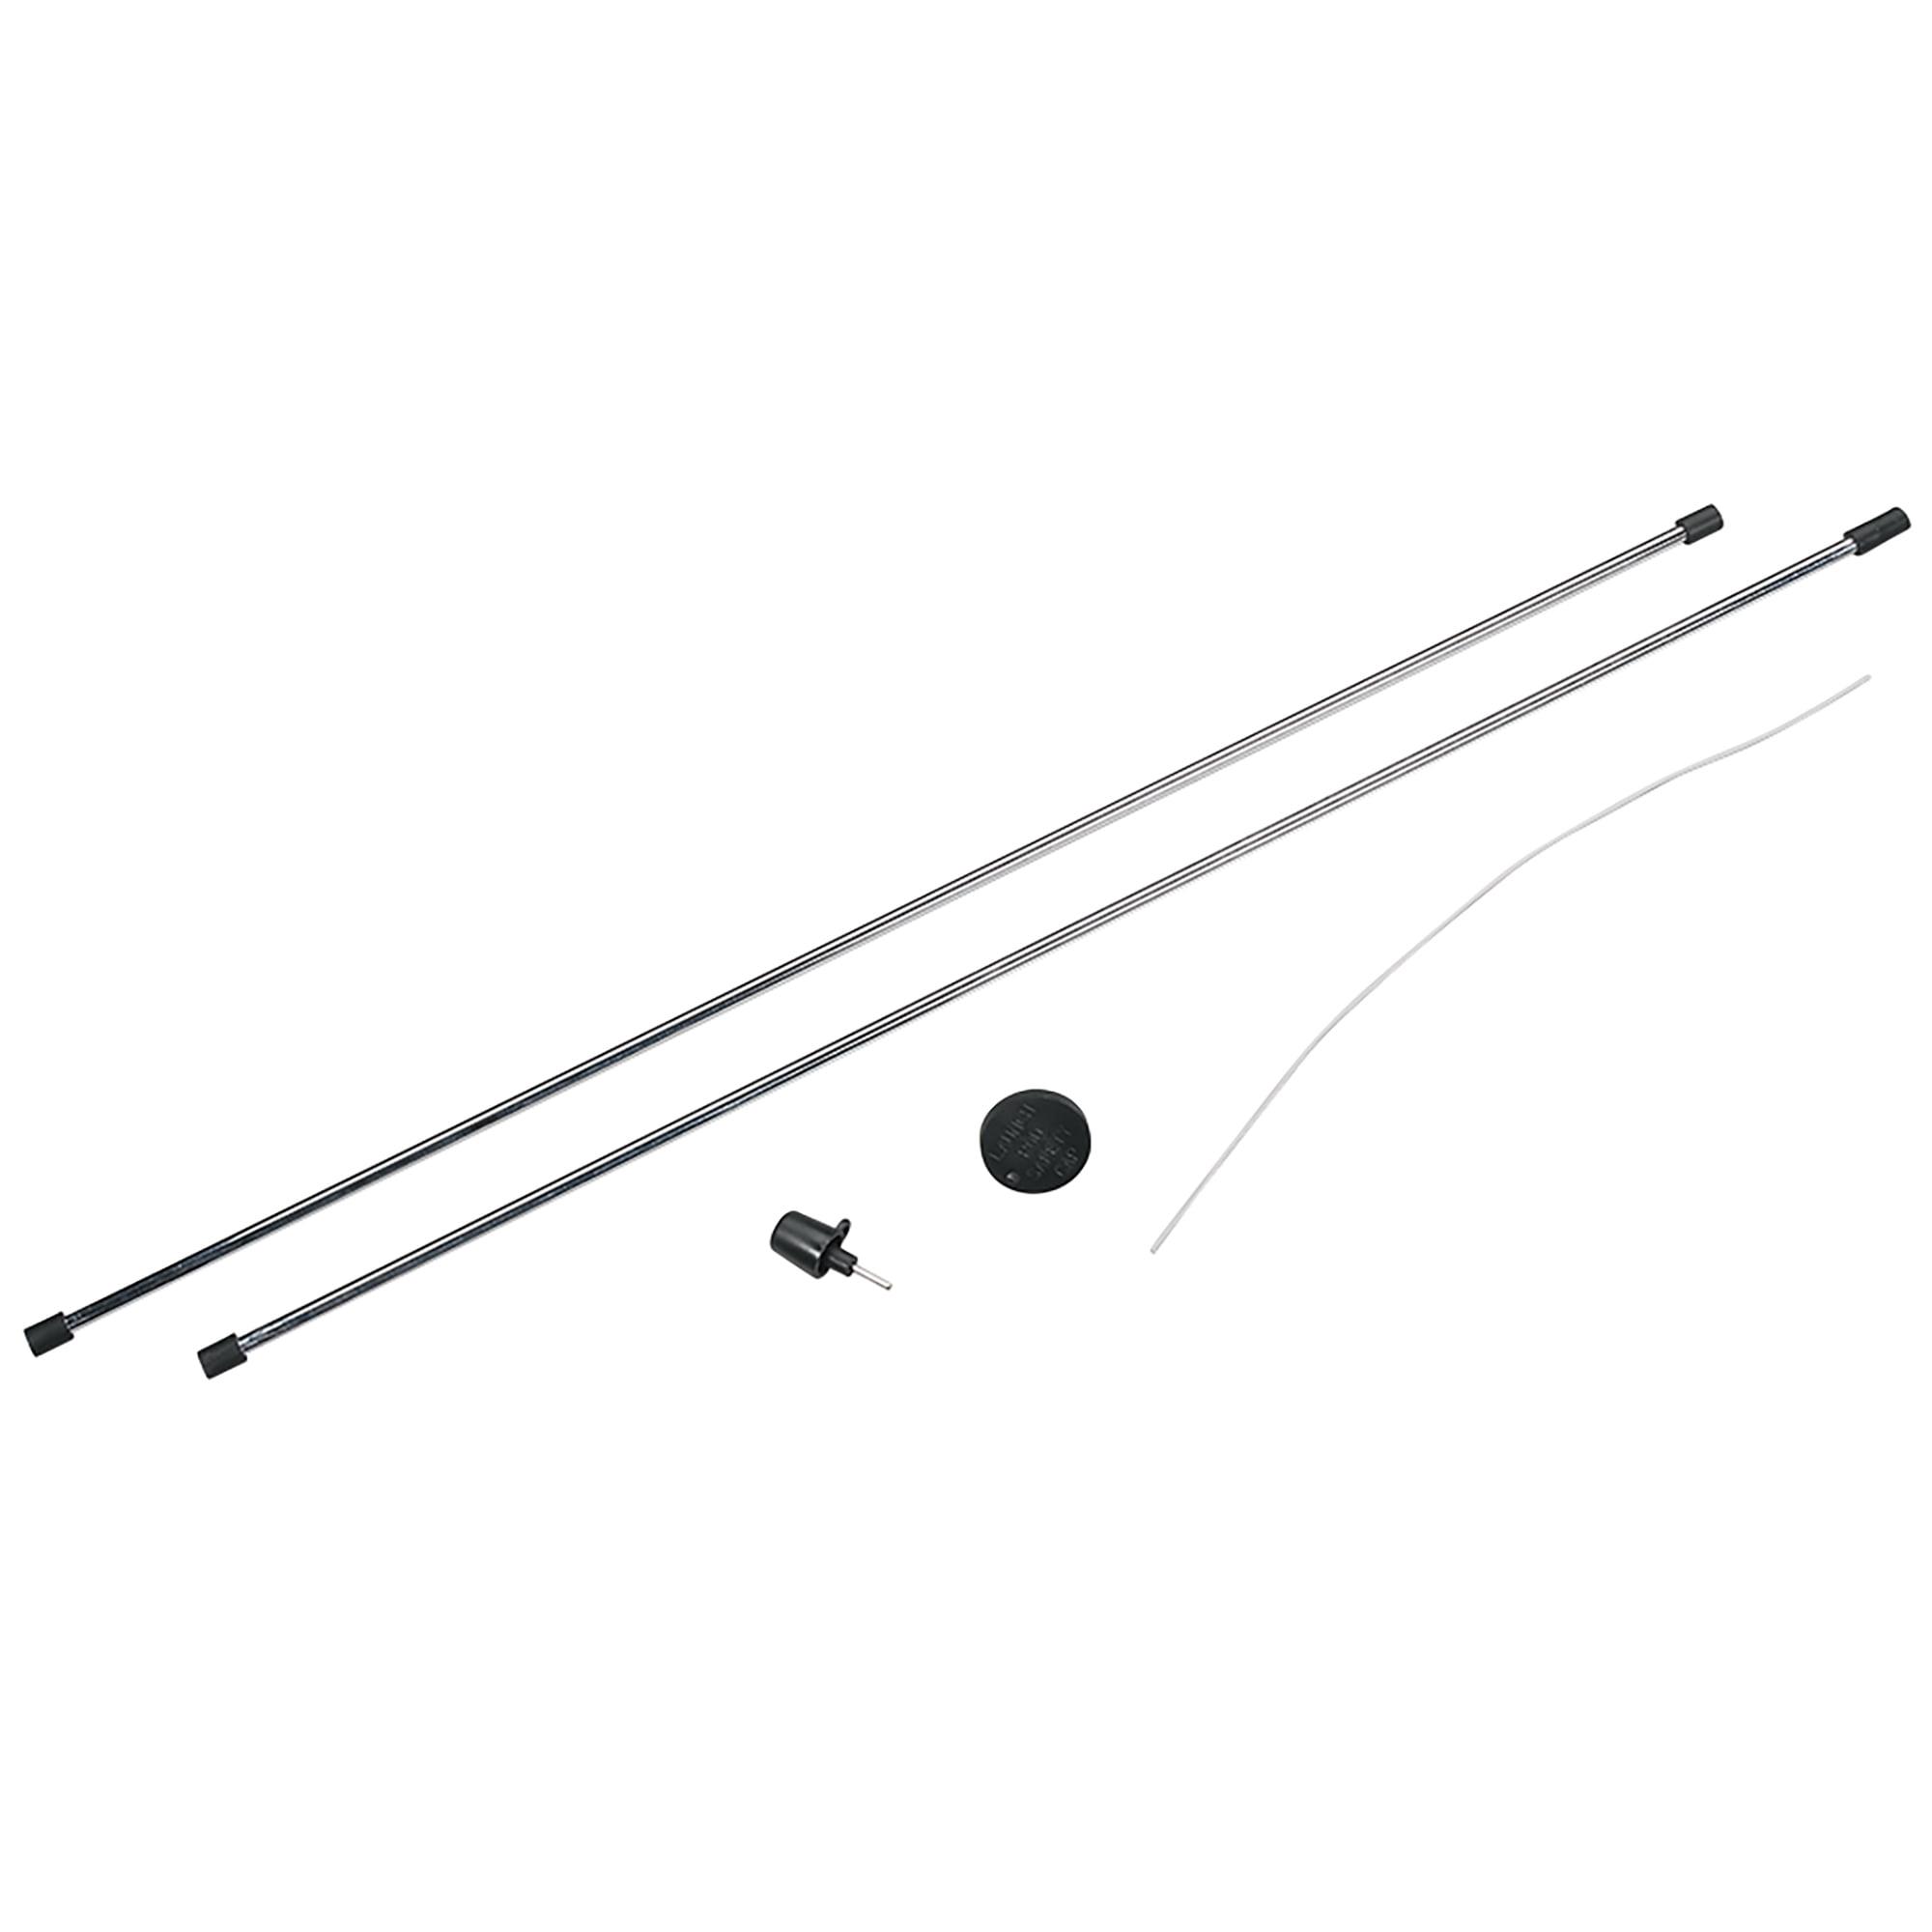 "Estes 3 16"" Two Piece Maxi Launch Rod by Estes-Cox Corp."